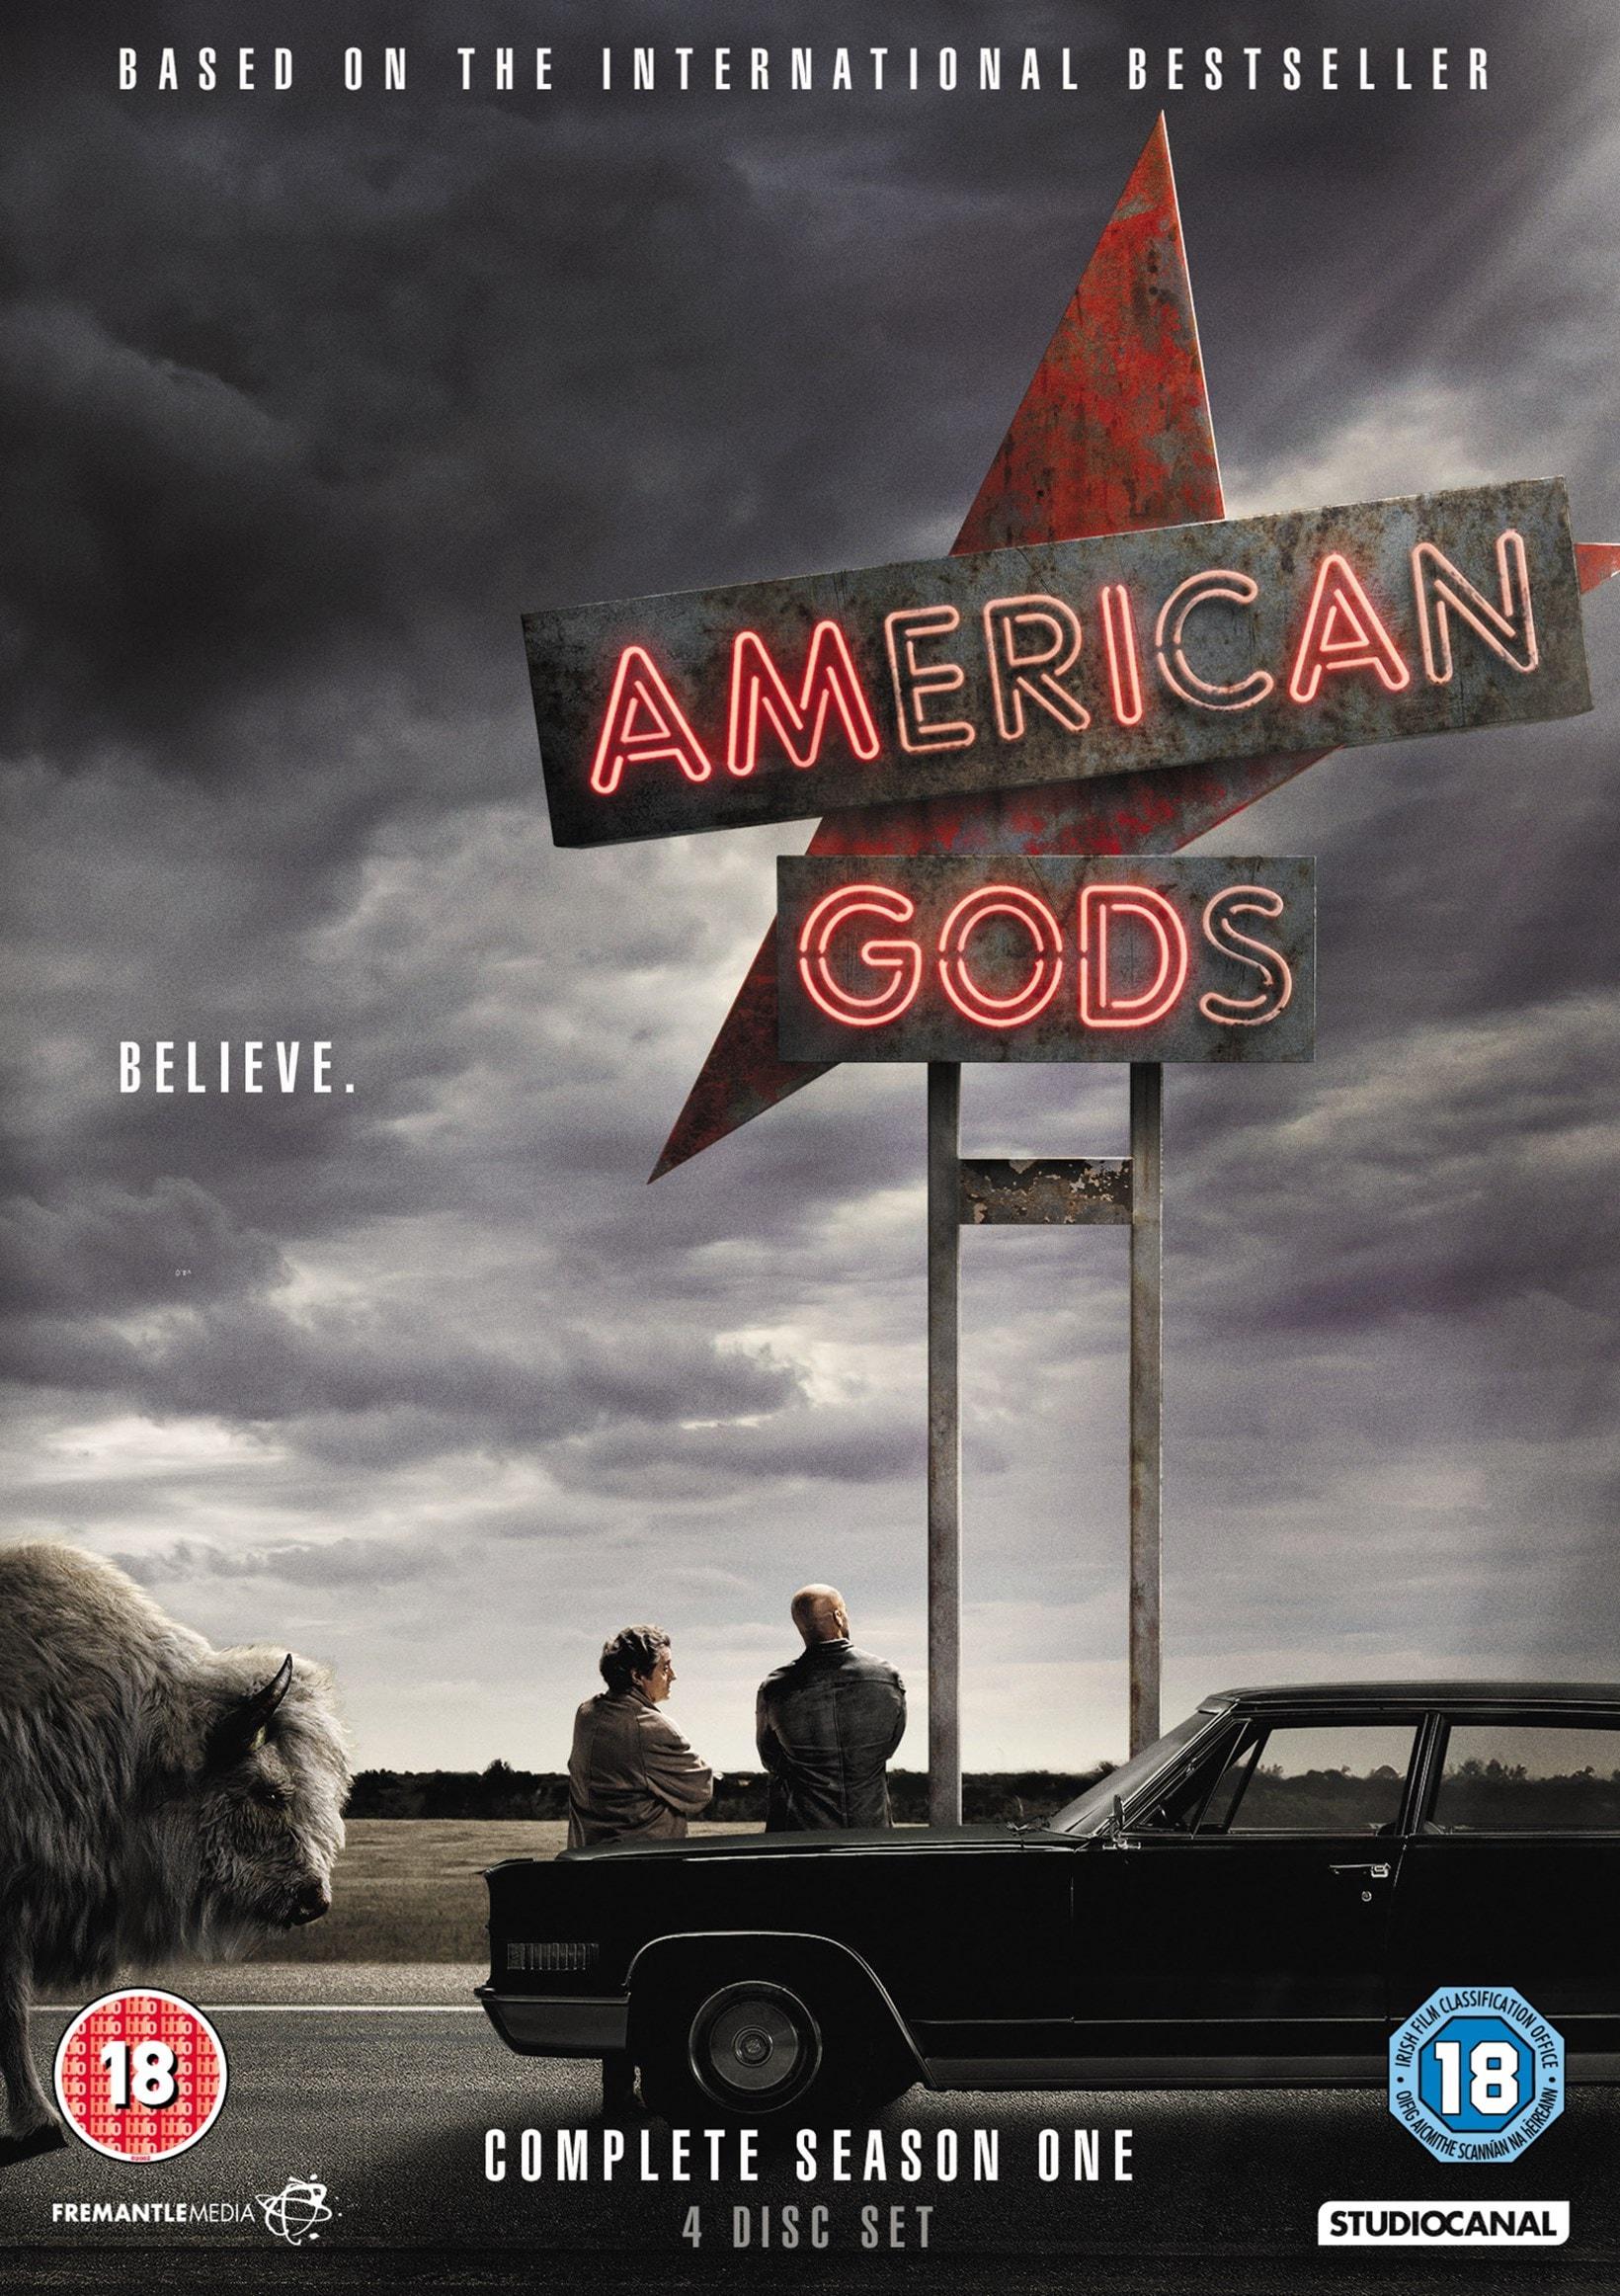 American Gods: Complete Season One